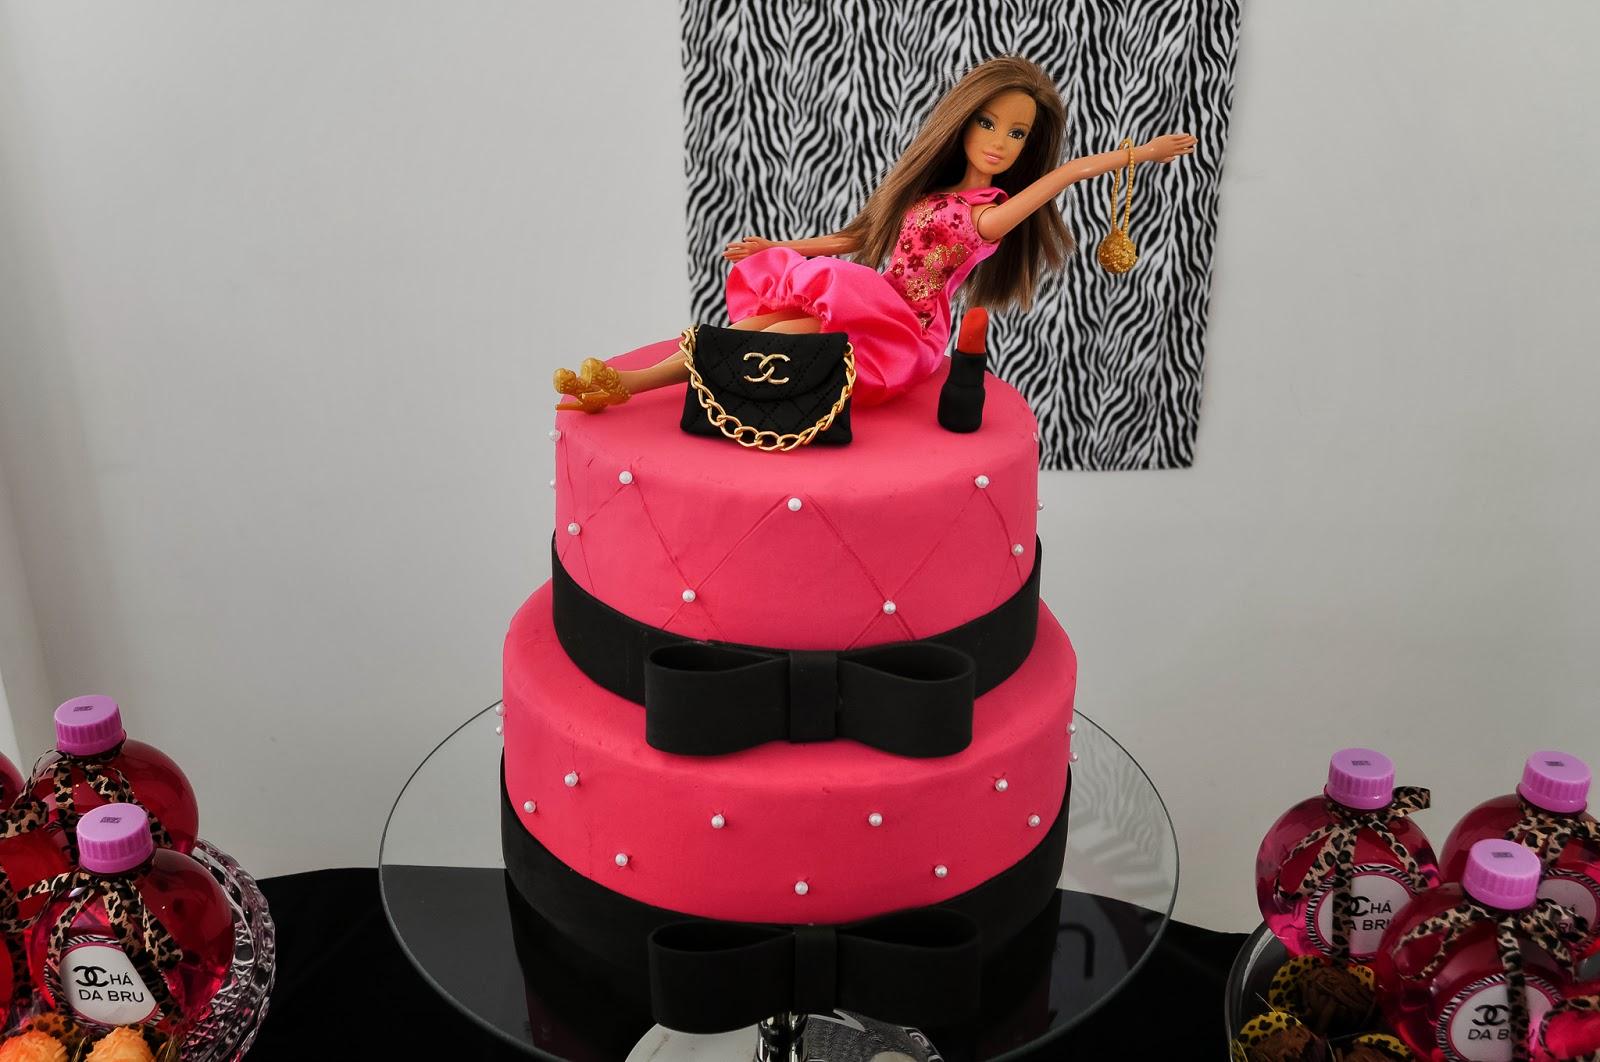 cha-lingerie-decoracao-mesa-bolo-bolo